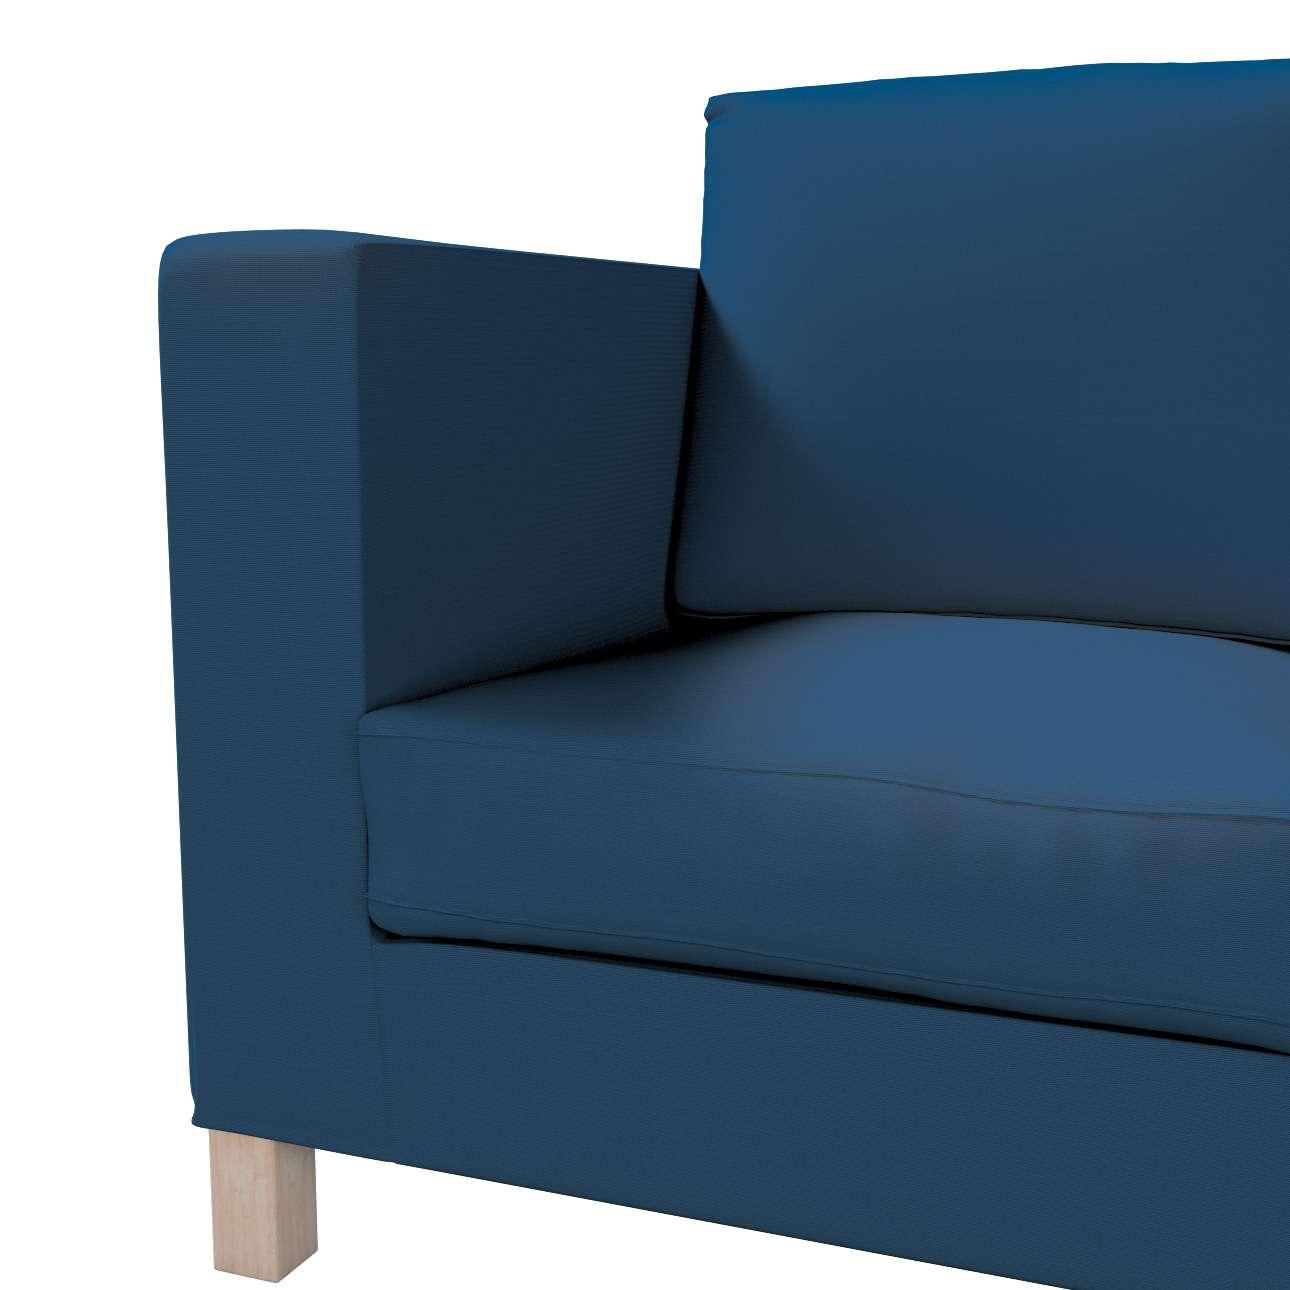 Karlanda klädsel <br>3-sits soffa - kort klädsel i kollektionen Panama Cotton, Tyg: 702-30